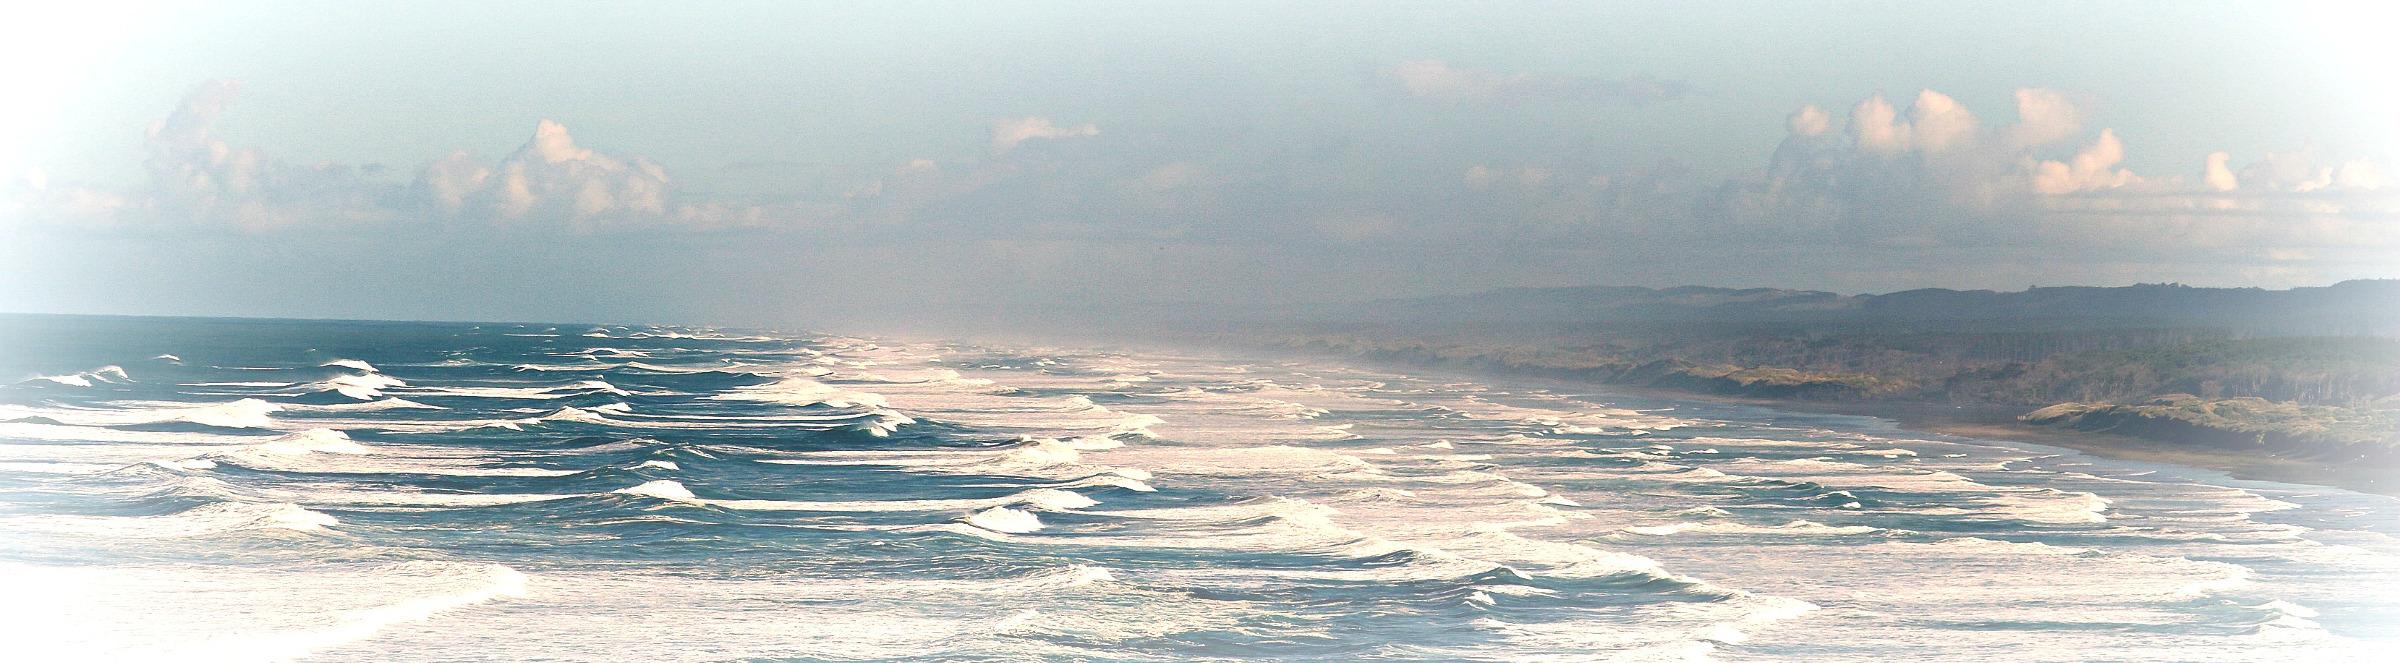 Muiwai iron sands, sea to sky, West Auckland, New Zealand